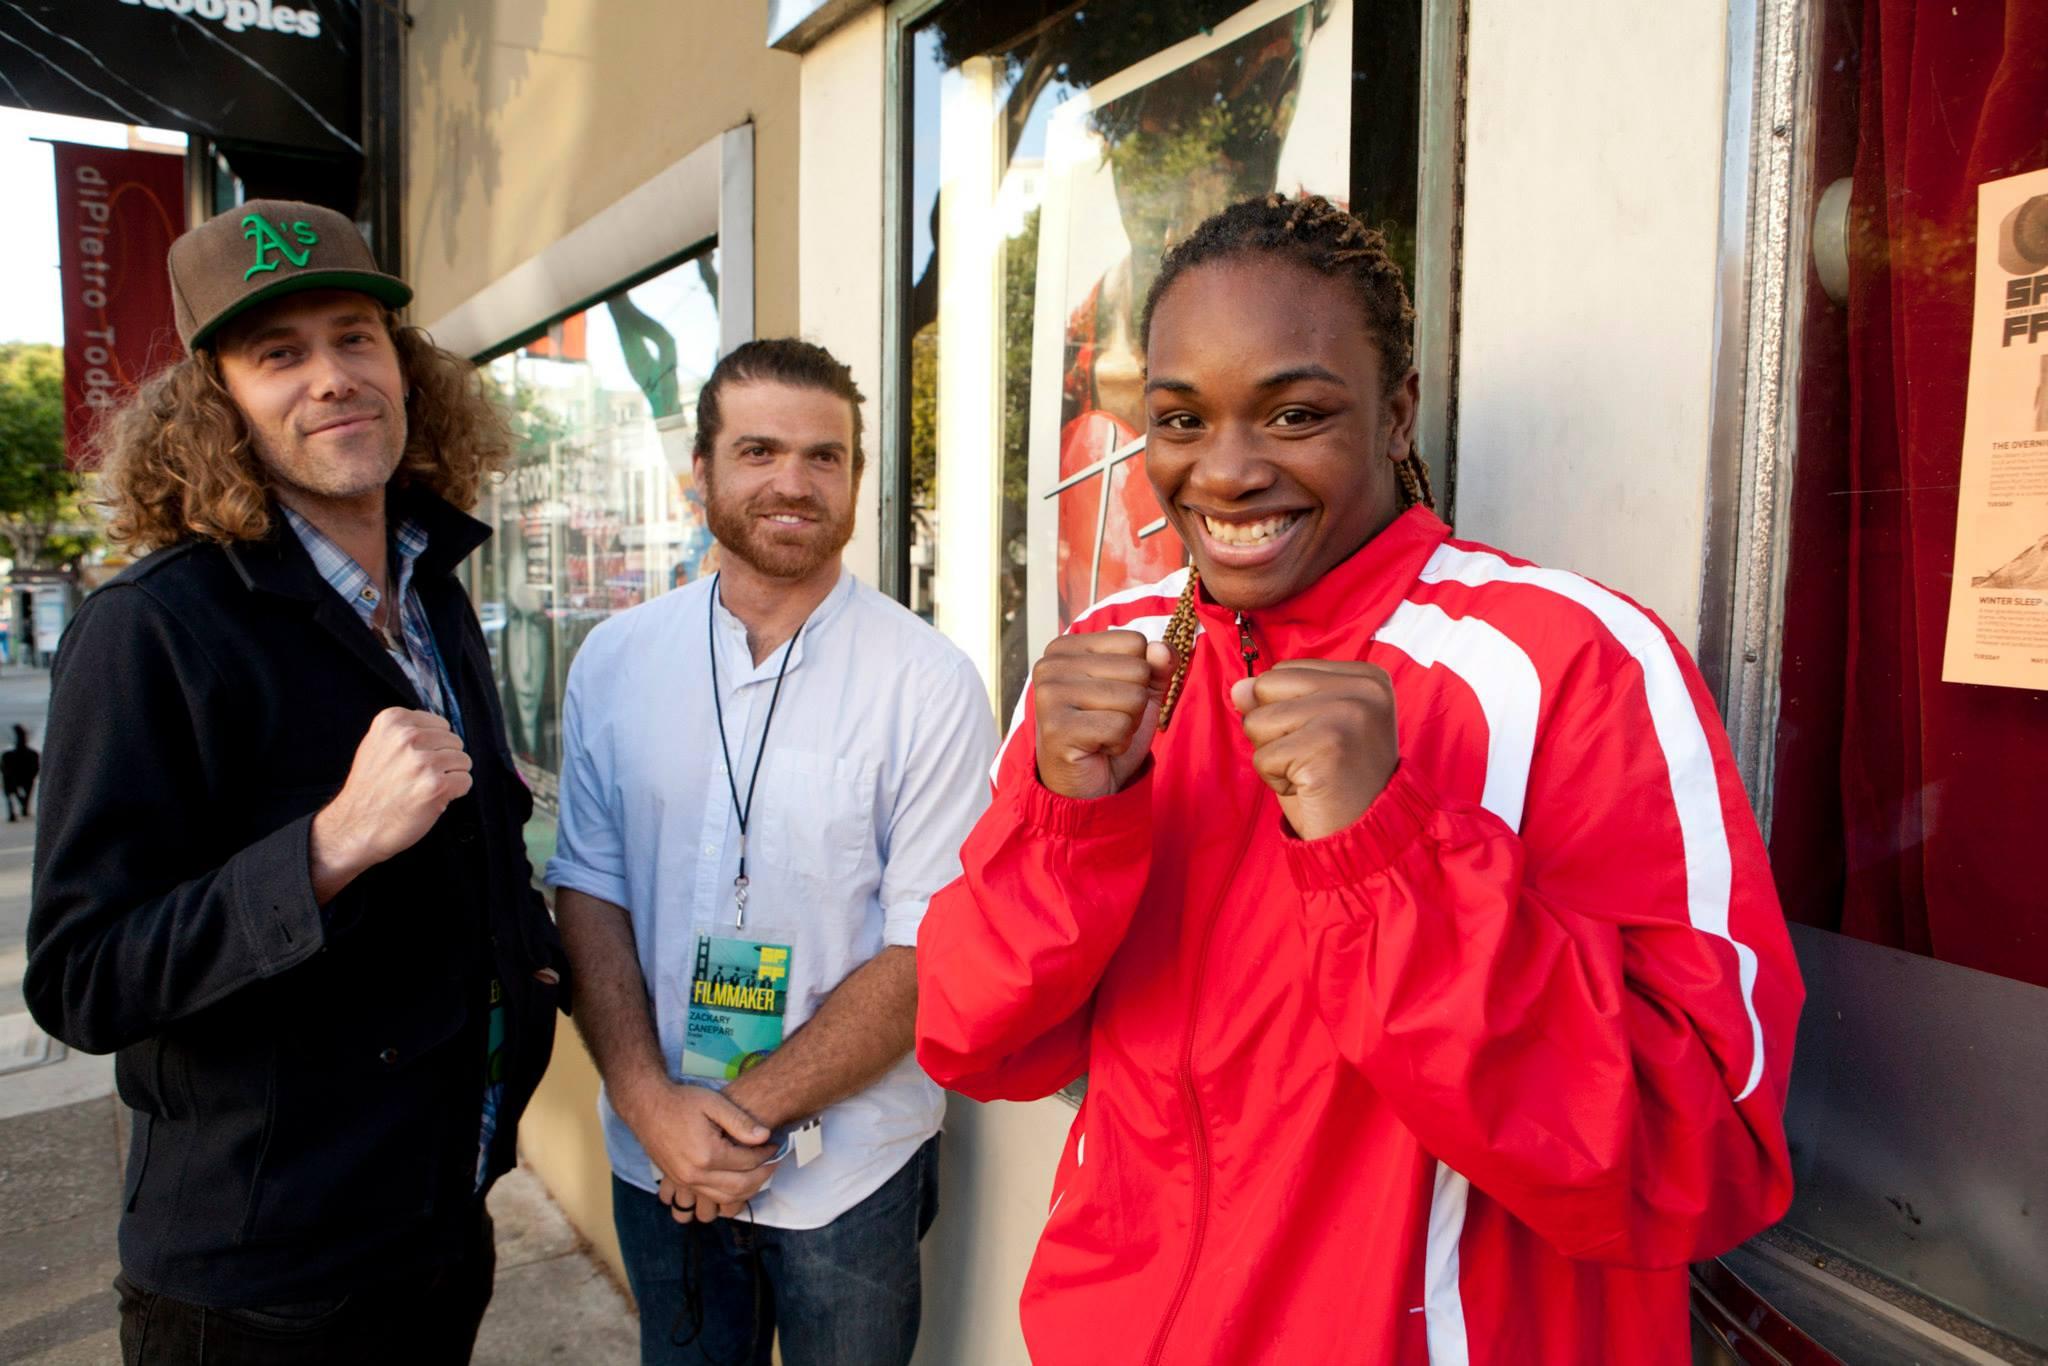 Directing duo Drea Cooper & Zackary Canepari and Olympic boxer Claressa Shields